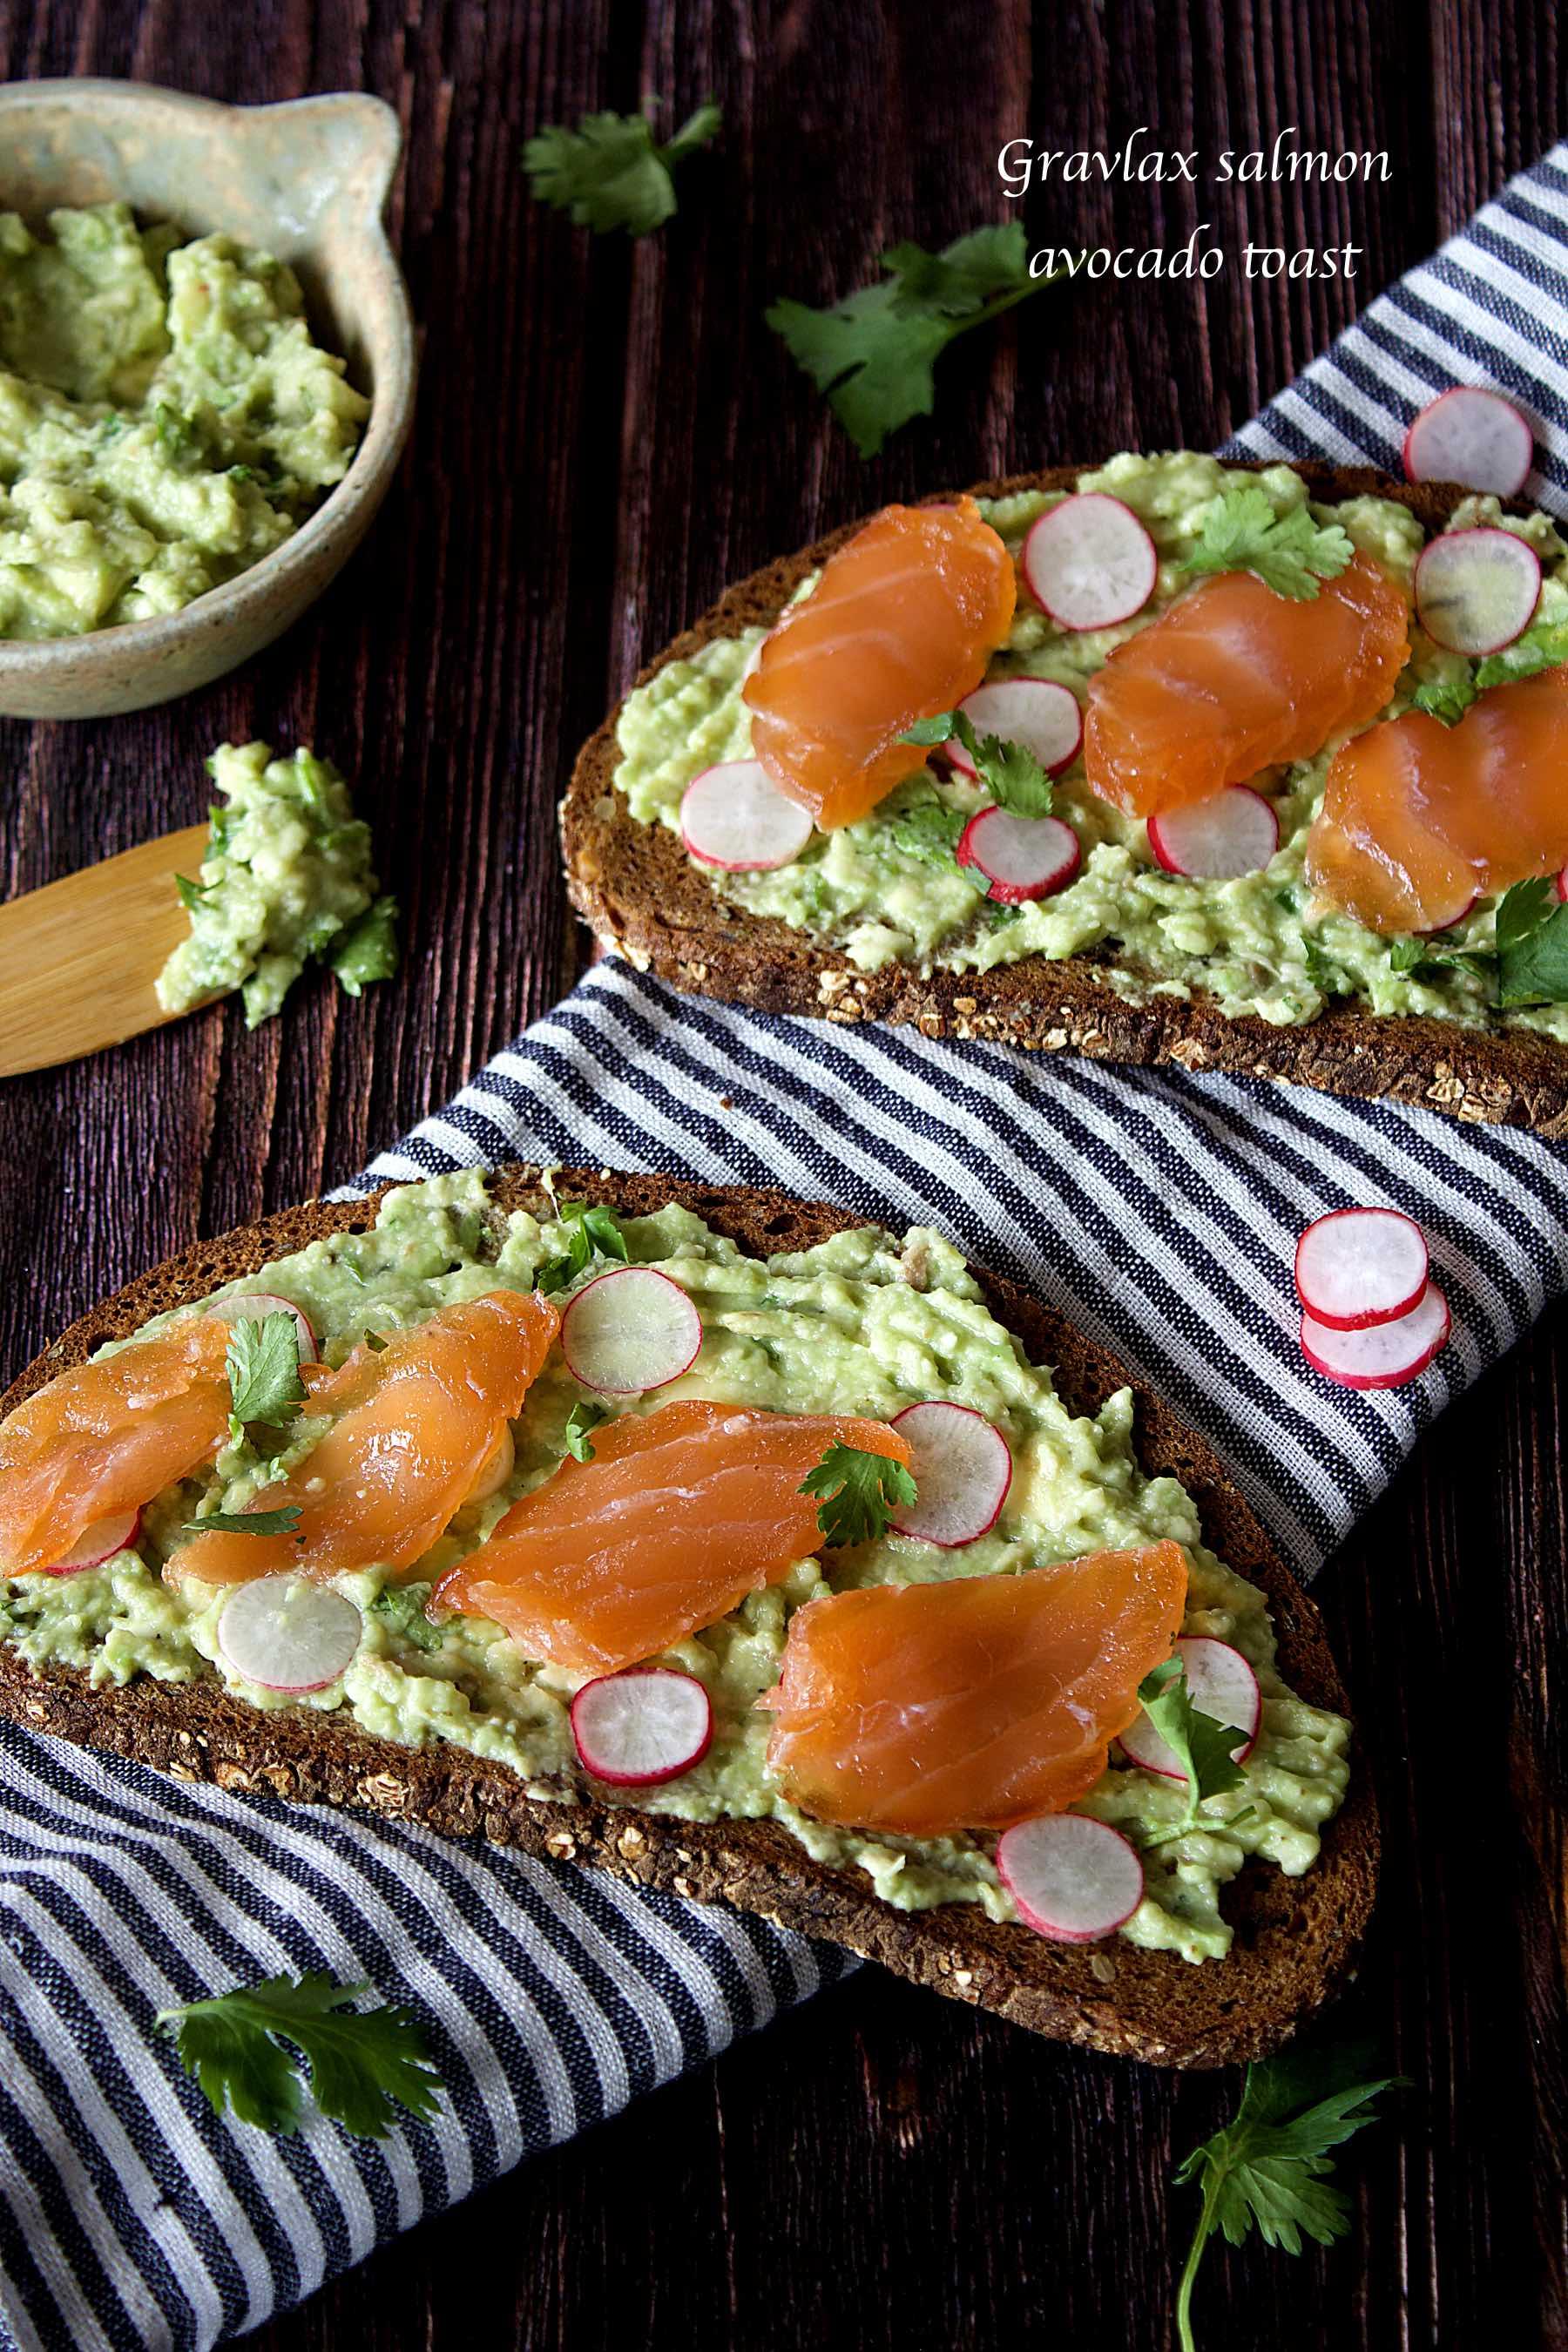 Gravlax salmon avocado toast